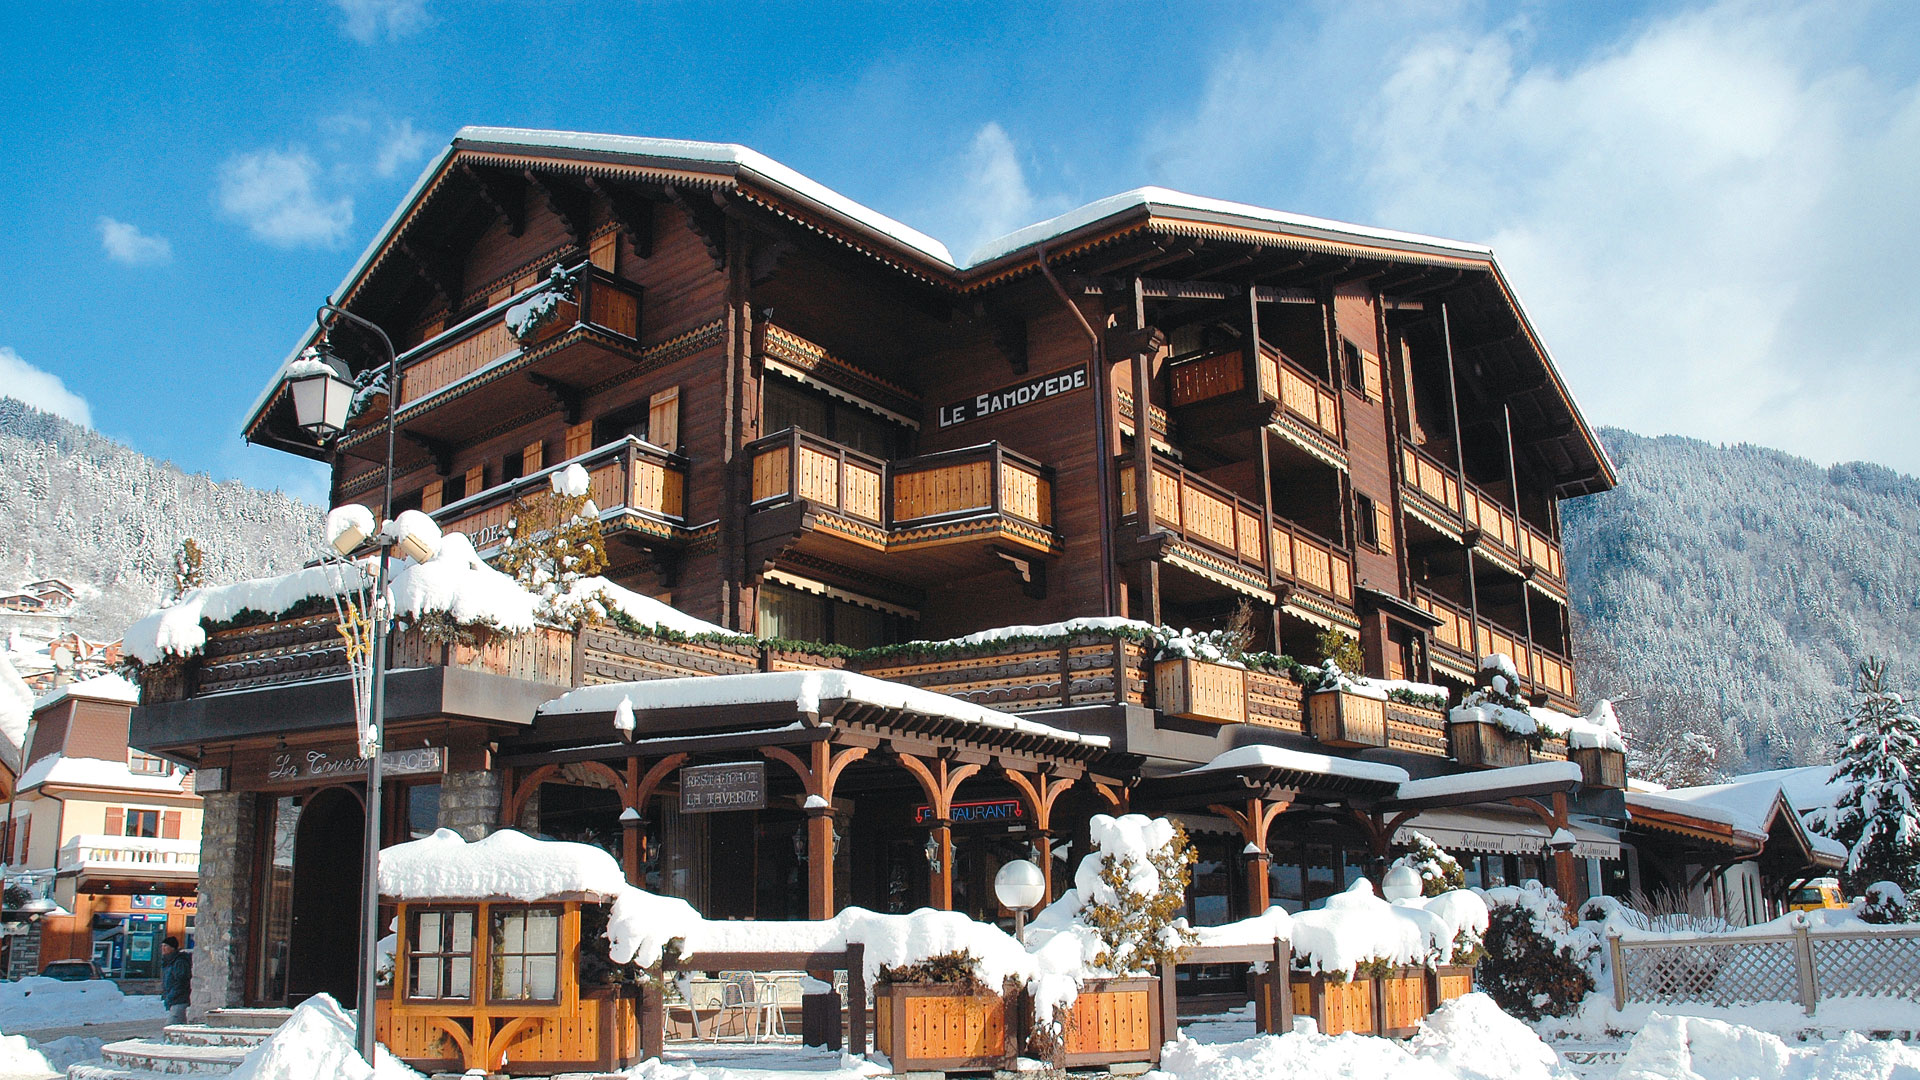 Winter rates 2019   2020 Htel Restaurant Spa Le Samoyde Morzine 1920x1080